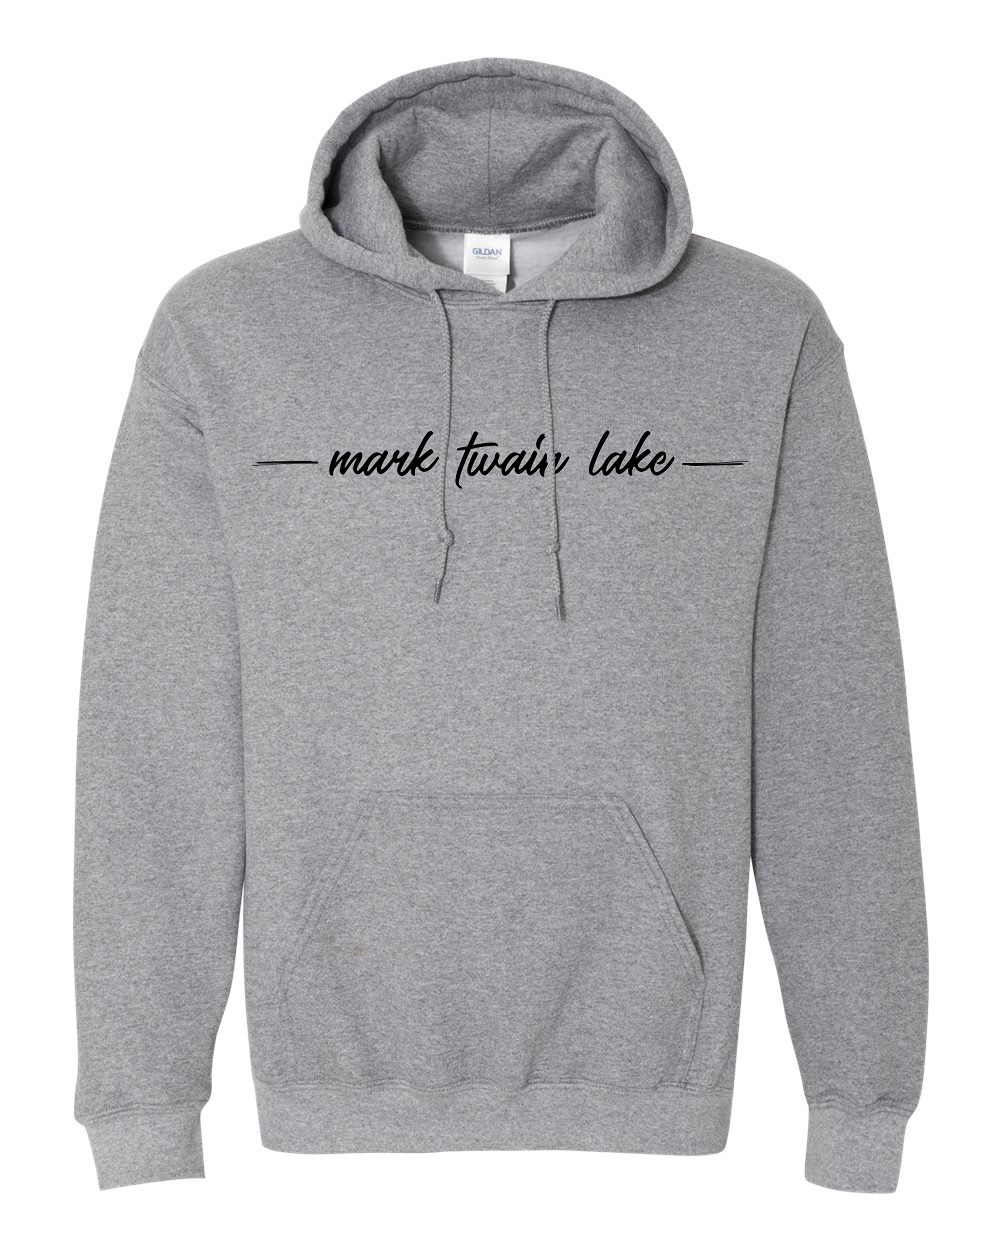 Mark Twain Lake Hoodie graphite